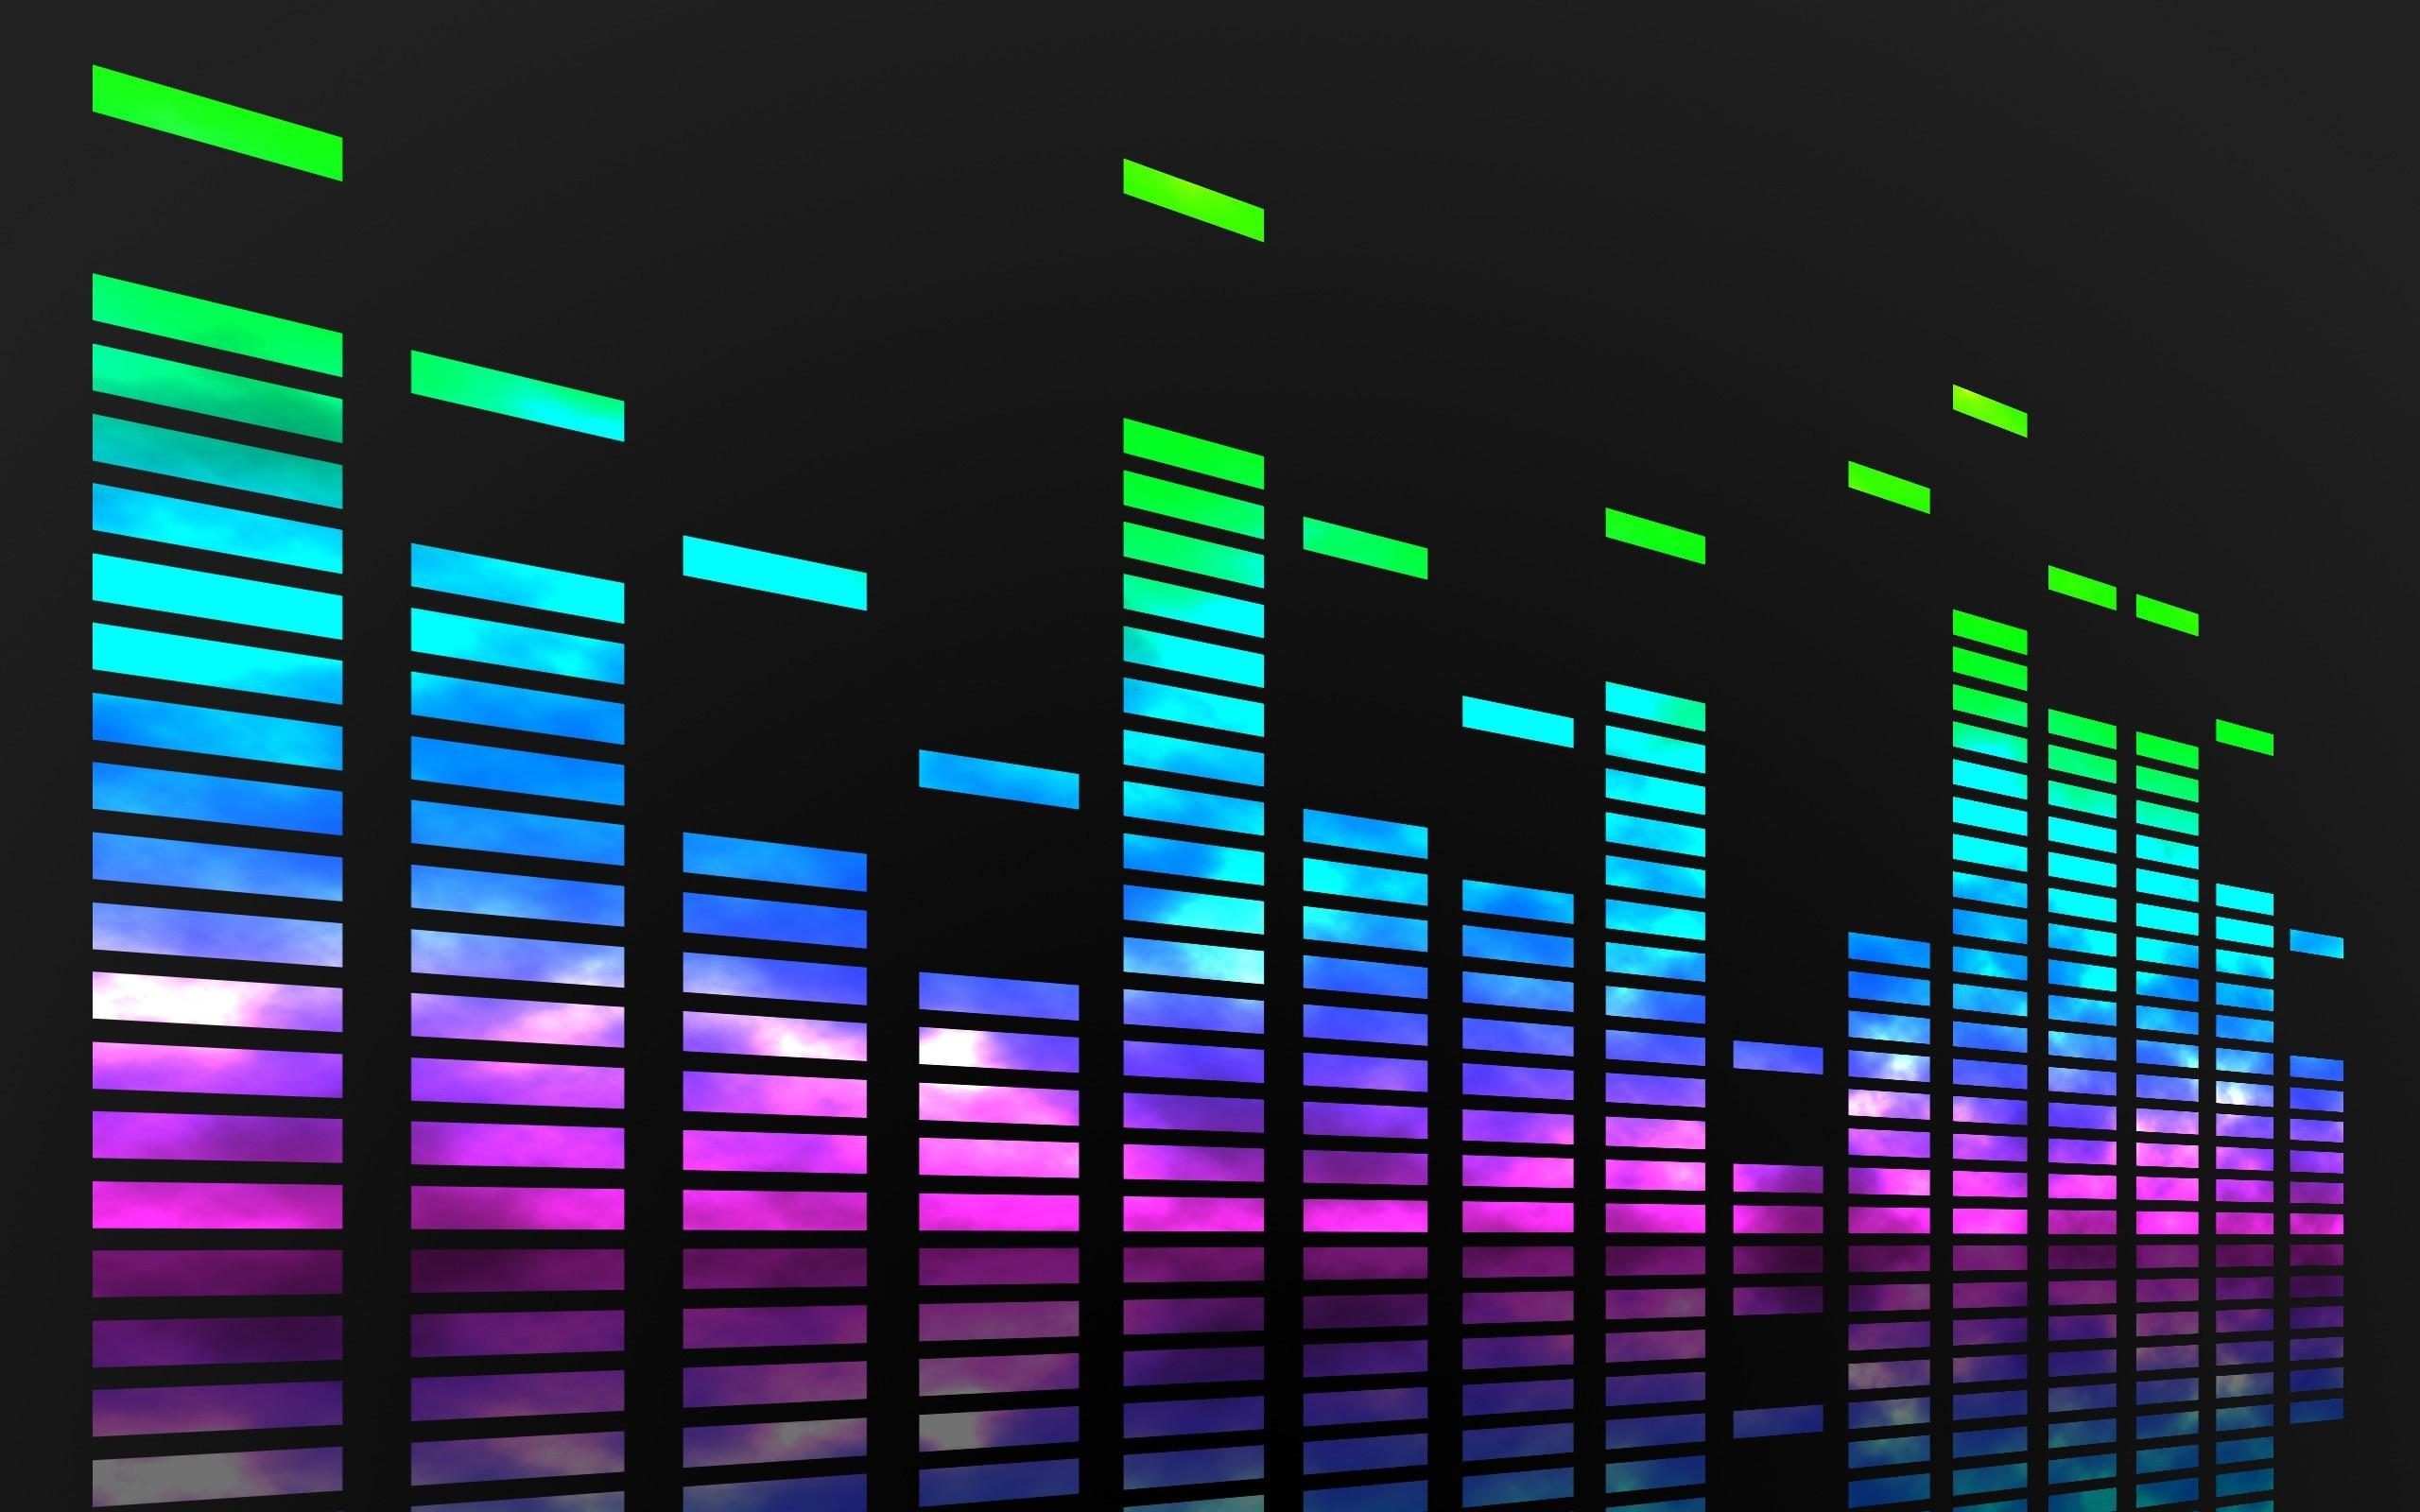 Guitar Girl Wallpaper Iphone Electronic Music Wallpapers 183 ① Wallpapertag